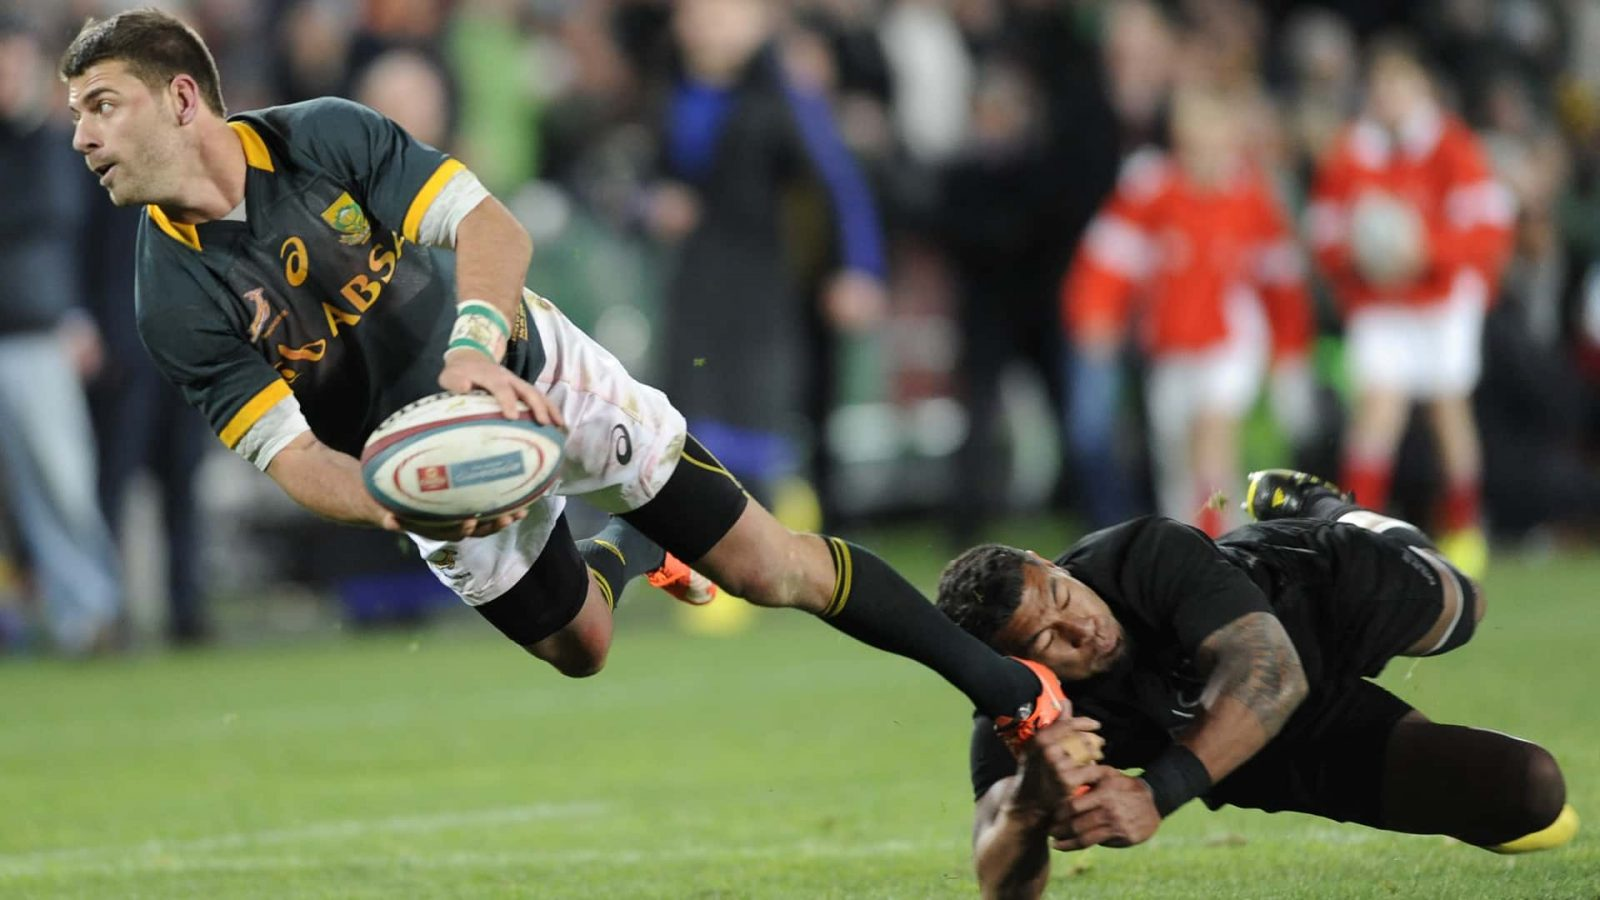 imagen de partido de rugby